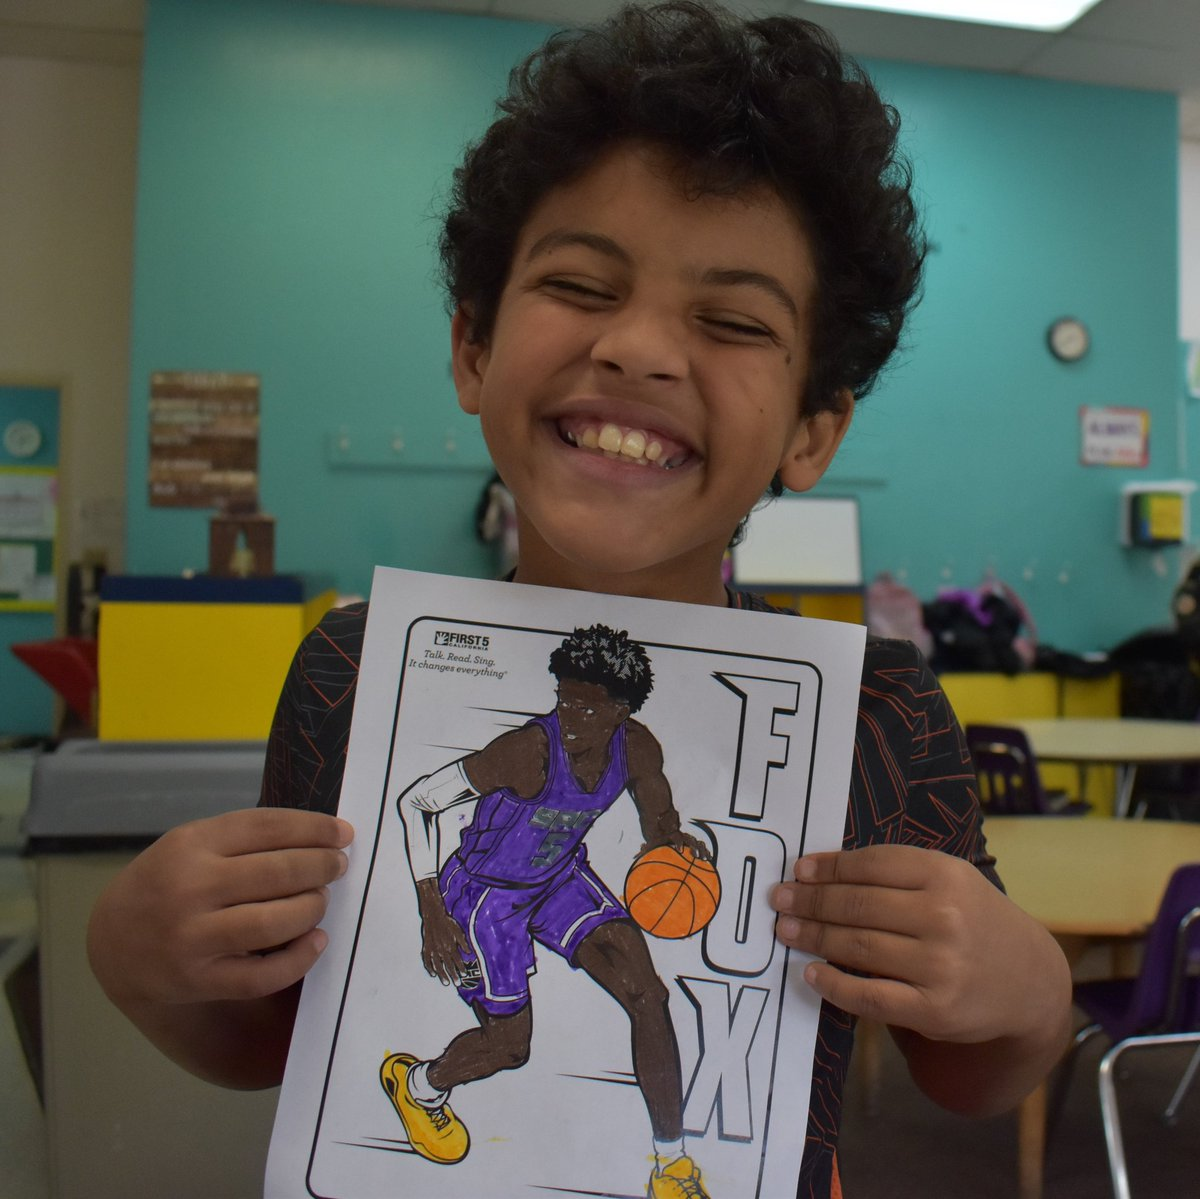 @SacramentoKings @swipathefox The kids at the #SacYMCA Emergency Child Care had fun coloring @swipathefox this week! Luckily we had enough purple to go around! Go @SacramentoKings! #KingsColoringContest https://t.co/fIZtLQqkZF